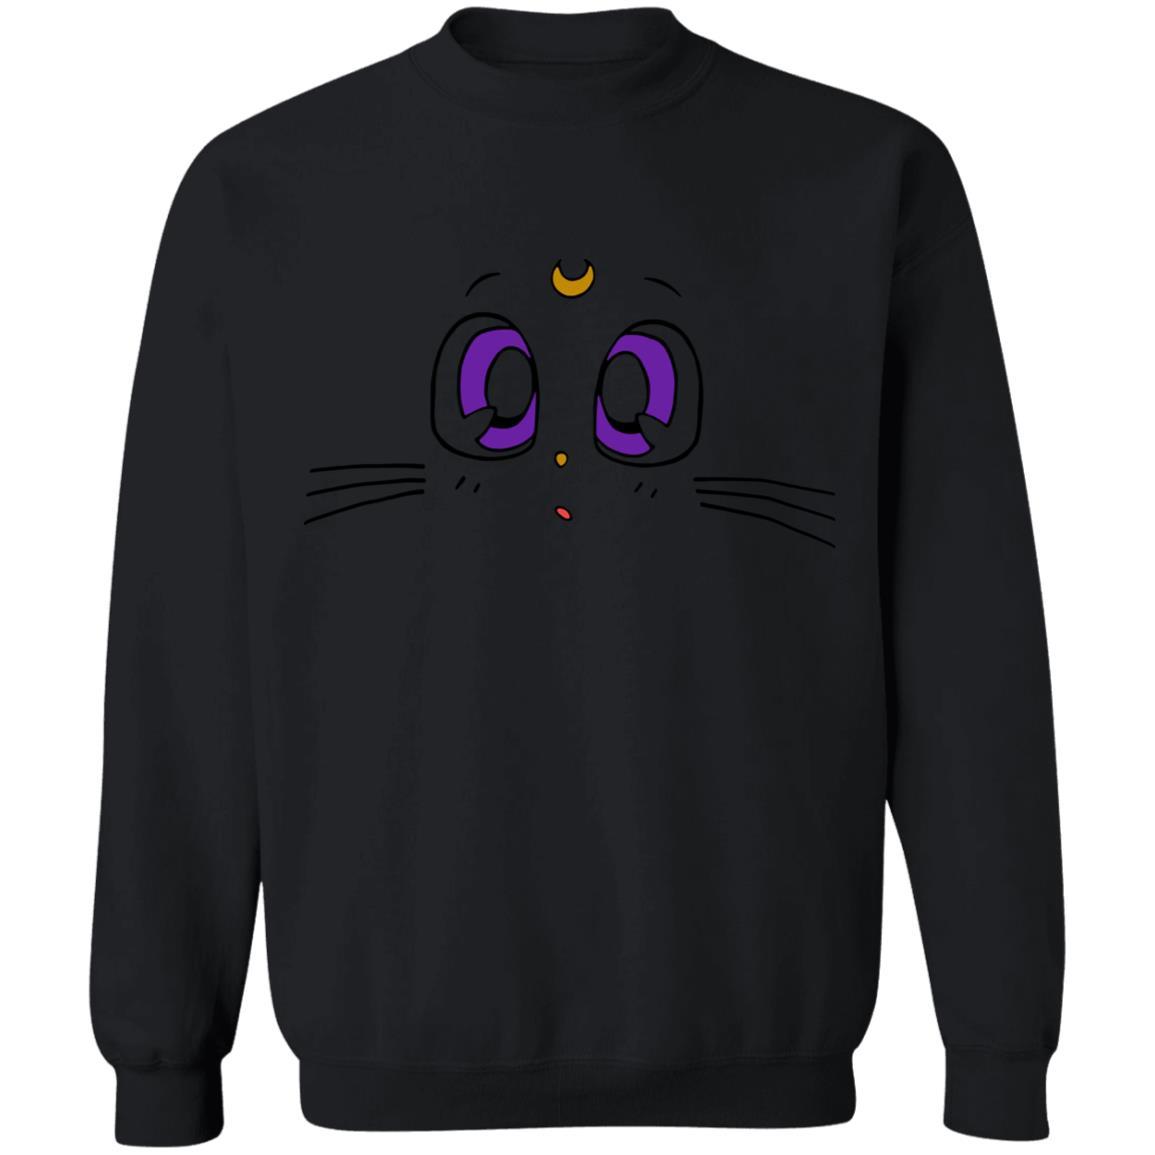 Sailormoon – Luna's Face Sweatshirt